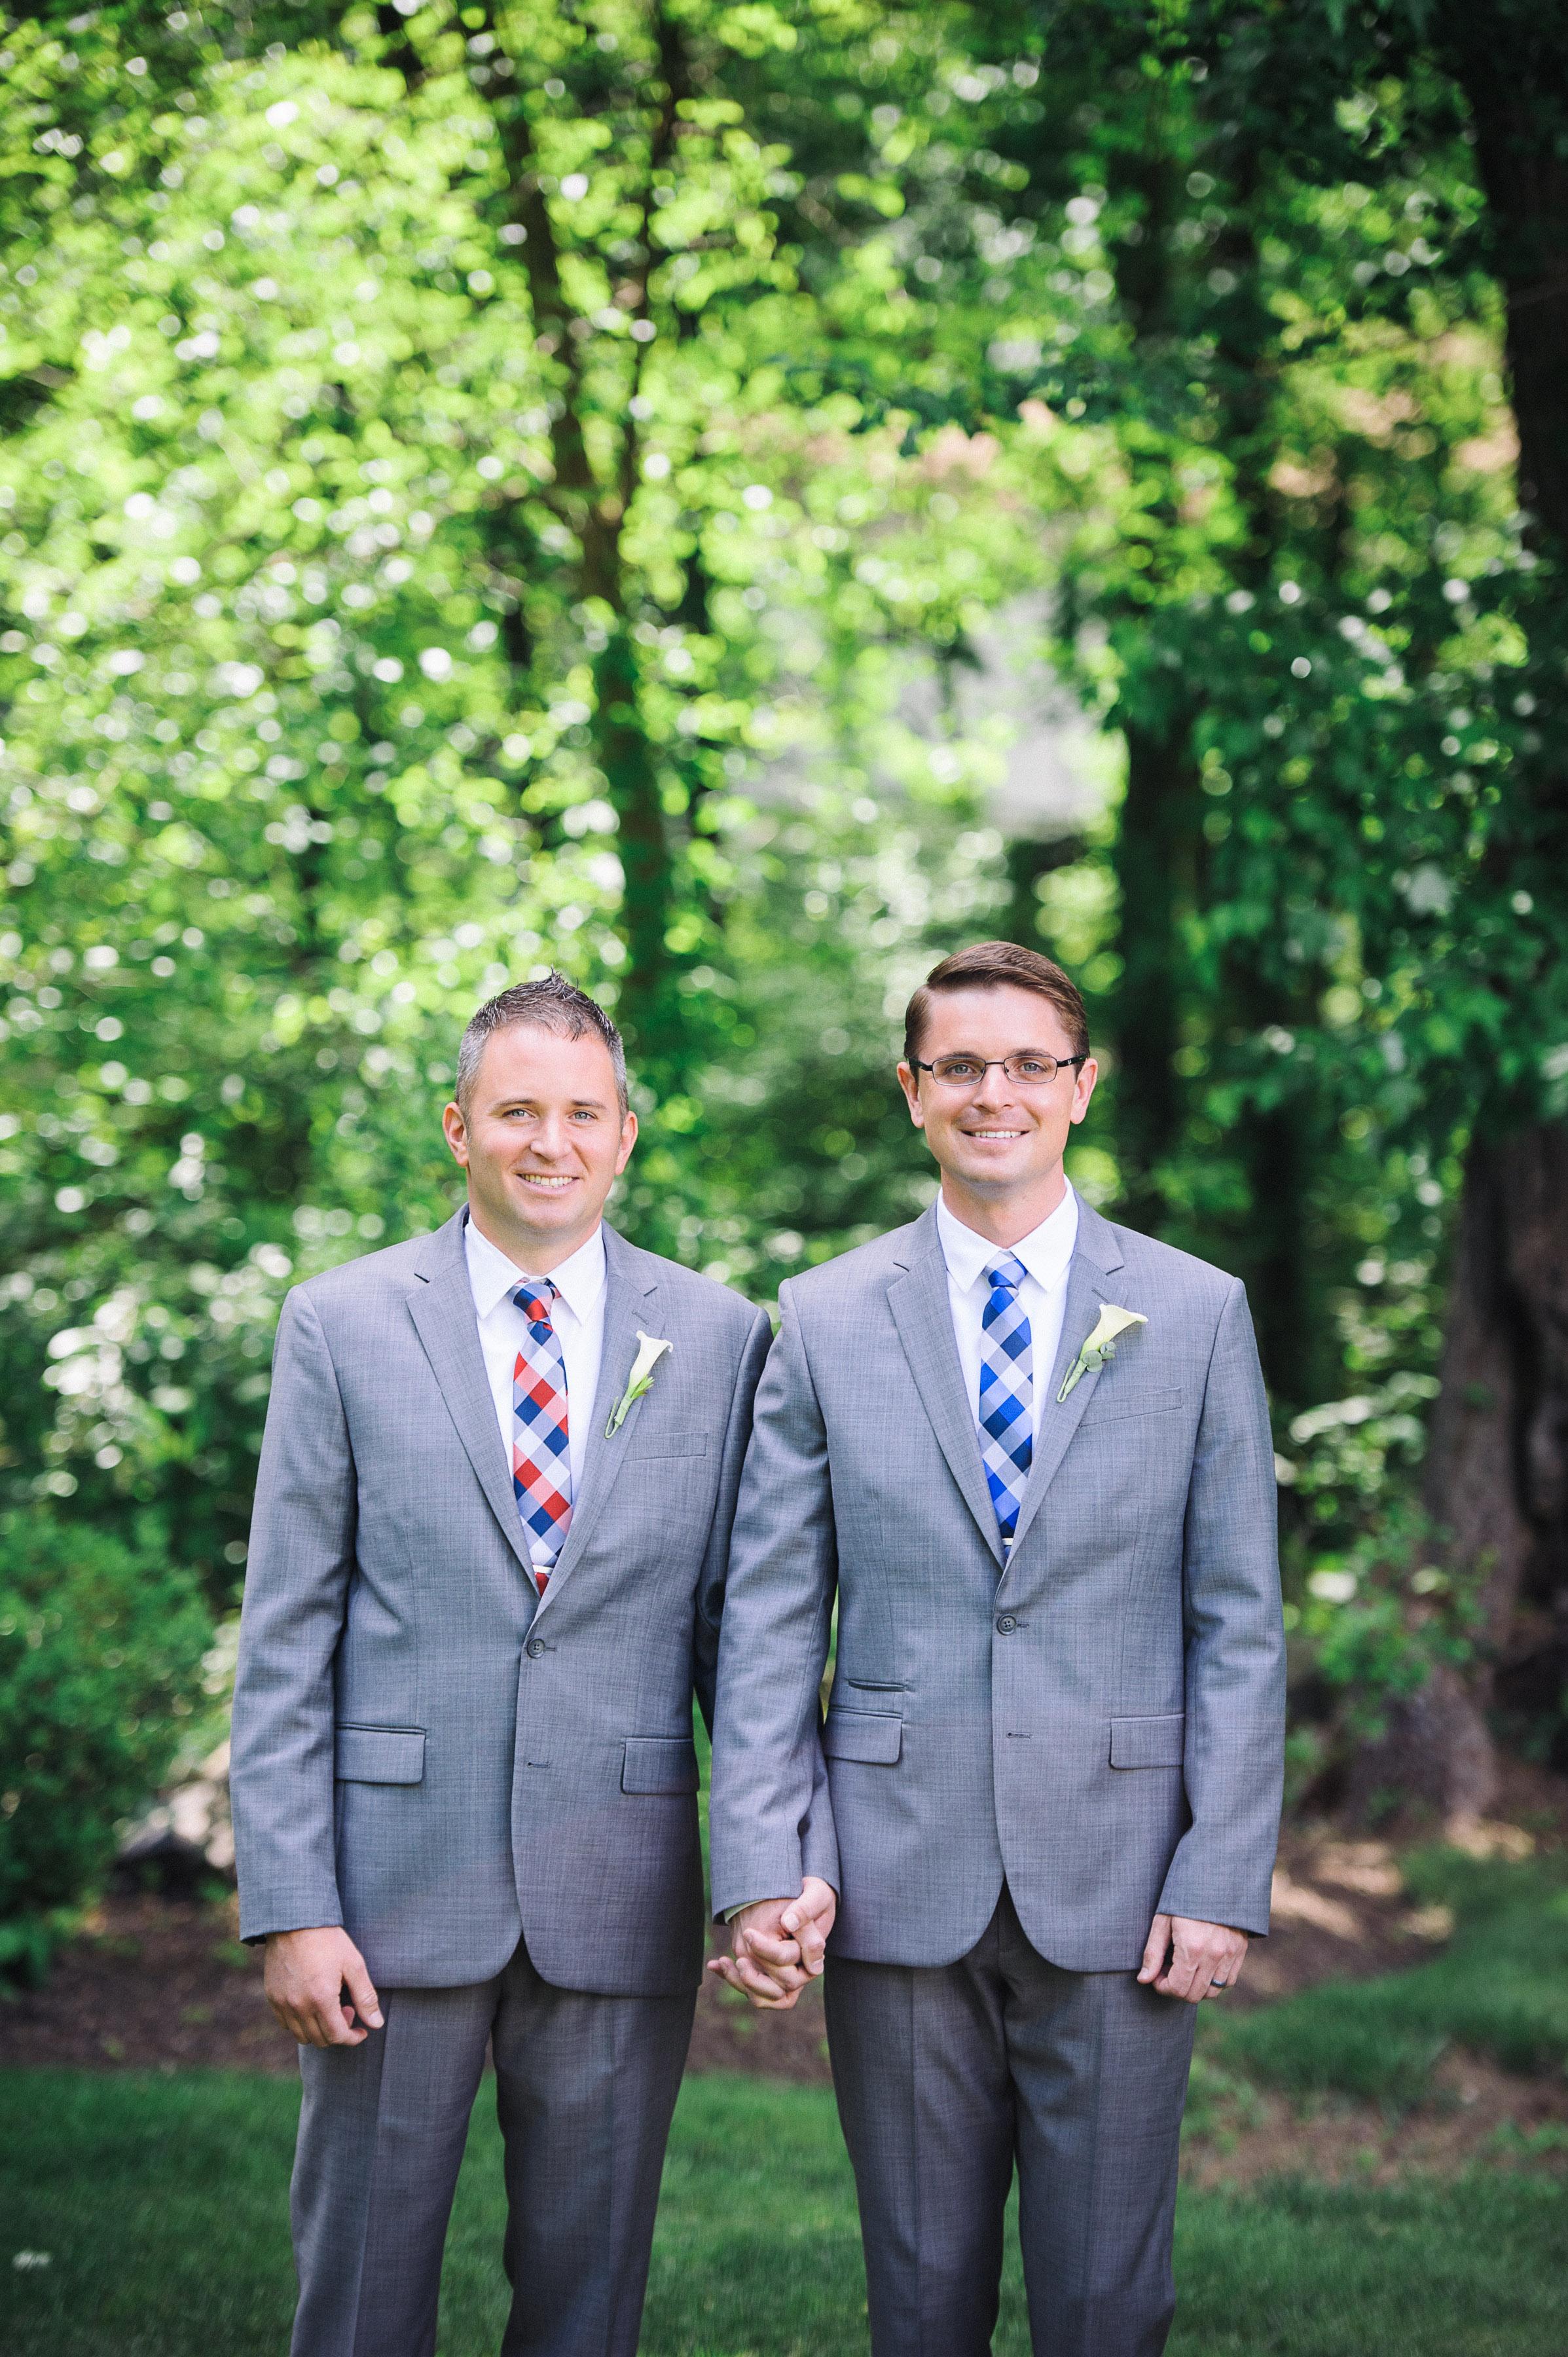 Same Sex Wedding CT Gay Wedding LGBT Wedding245.JPG